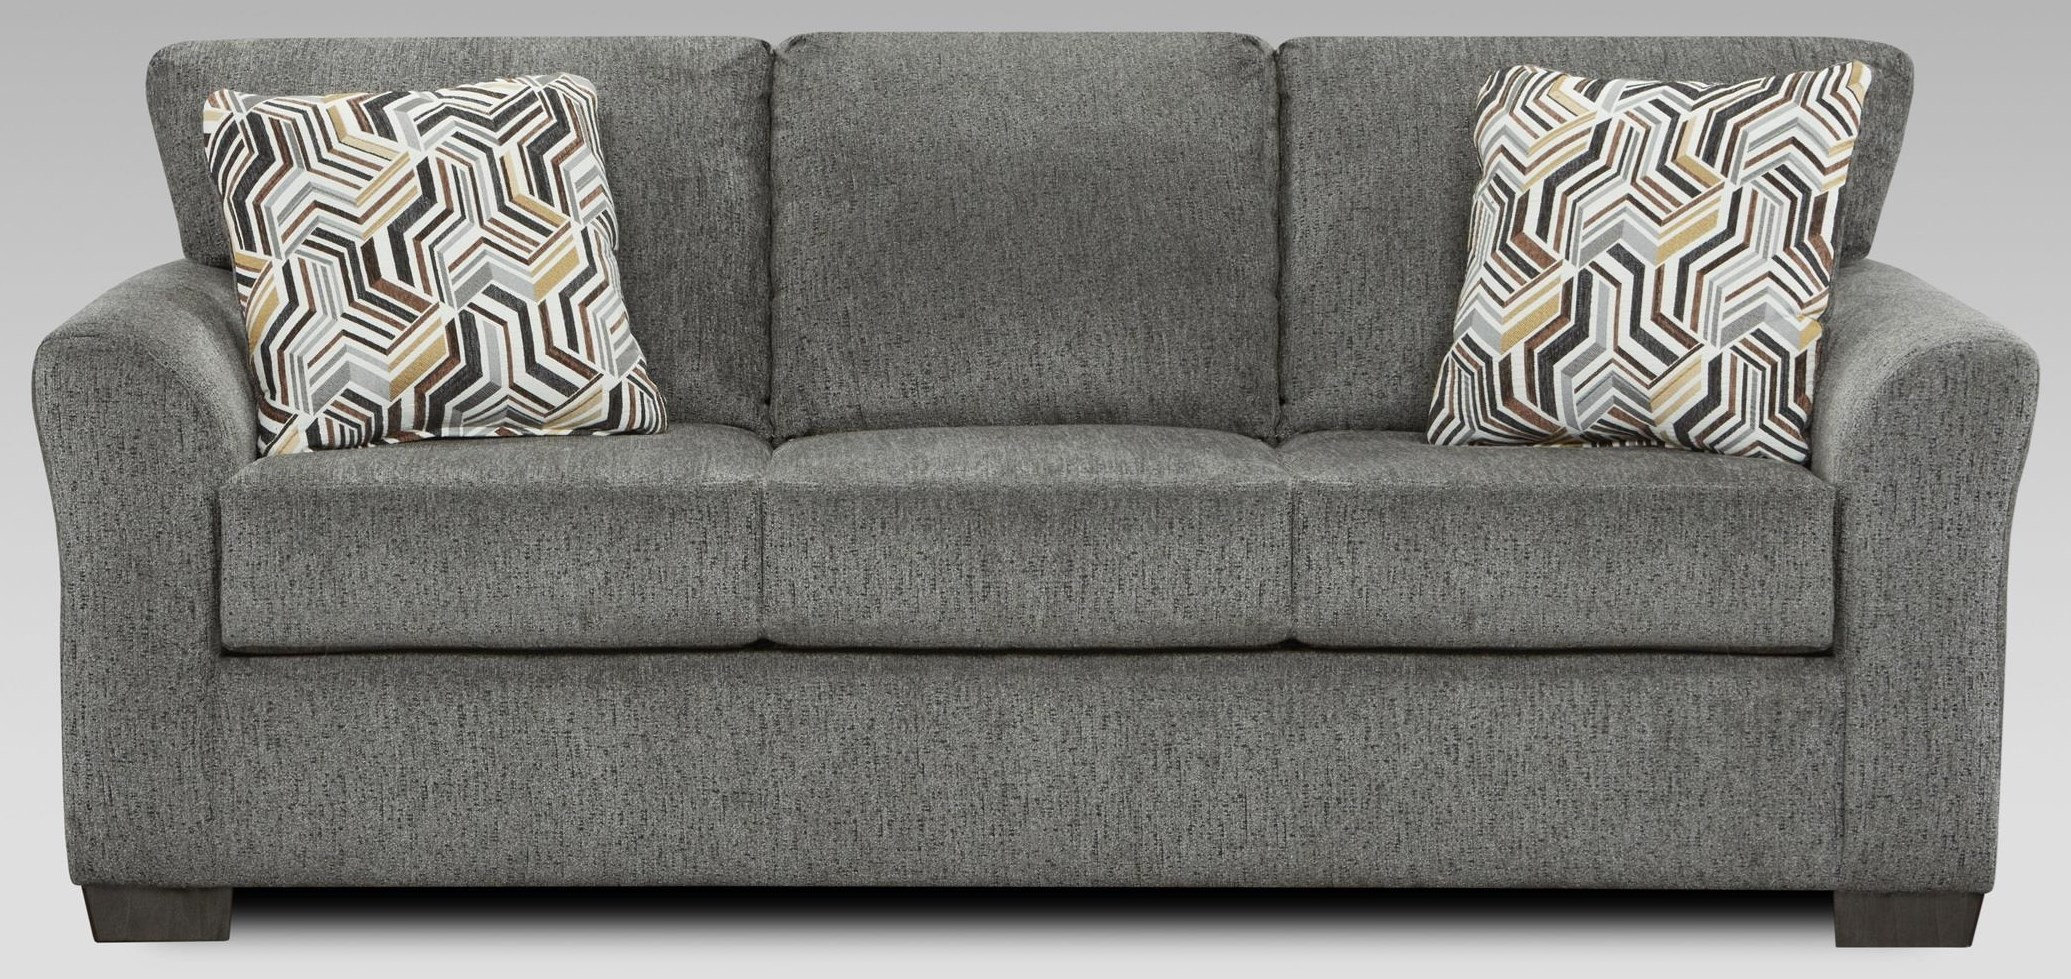 3333 3333 Grey Sleeper Sofa by Affordable Furniture at Furniture Fair - North Carolina